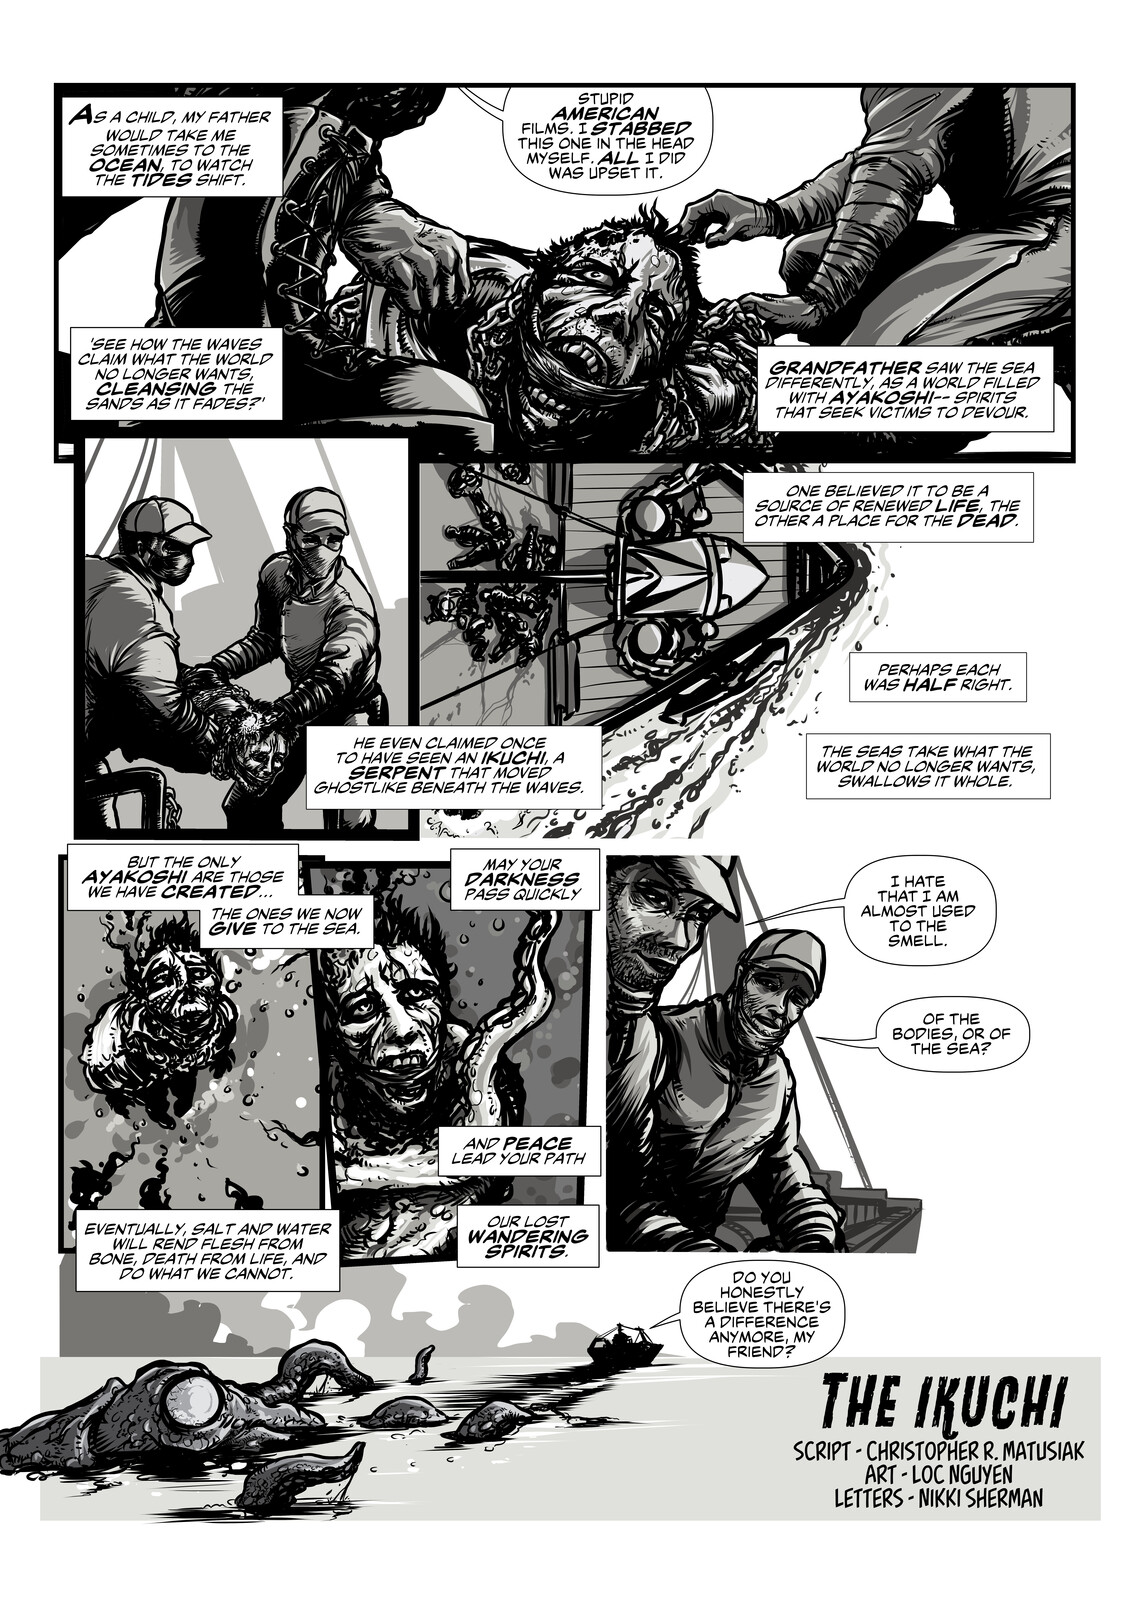 The IKUCHI - One page comic